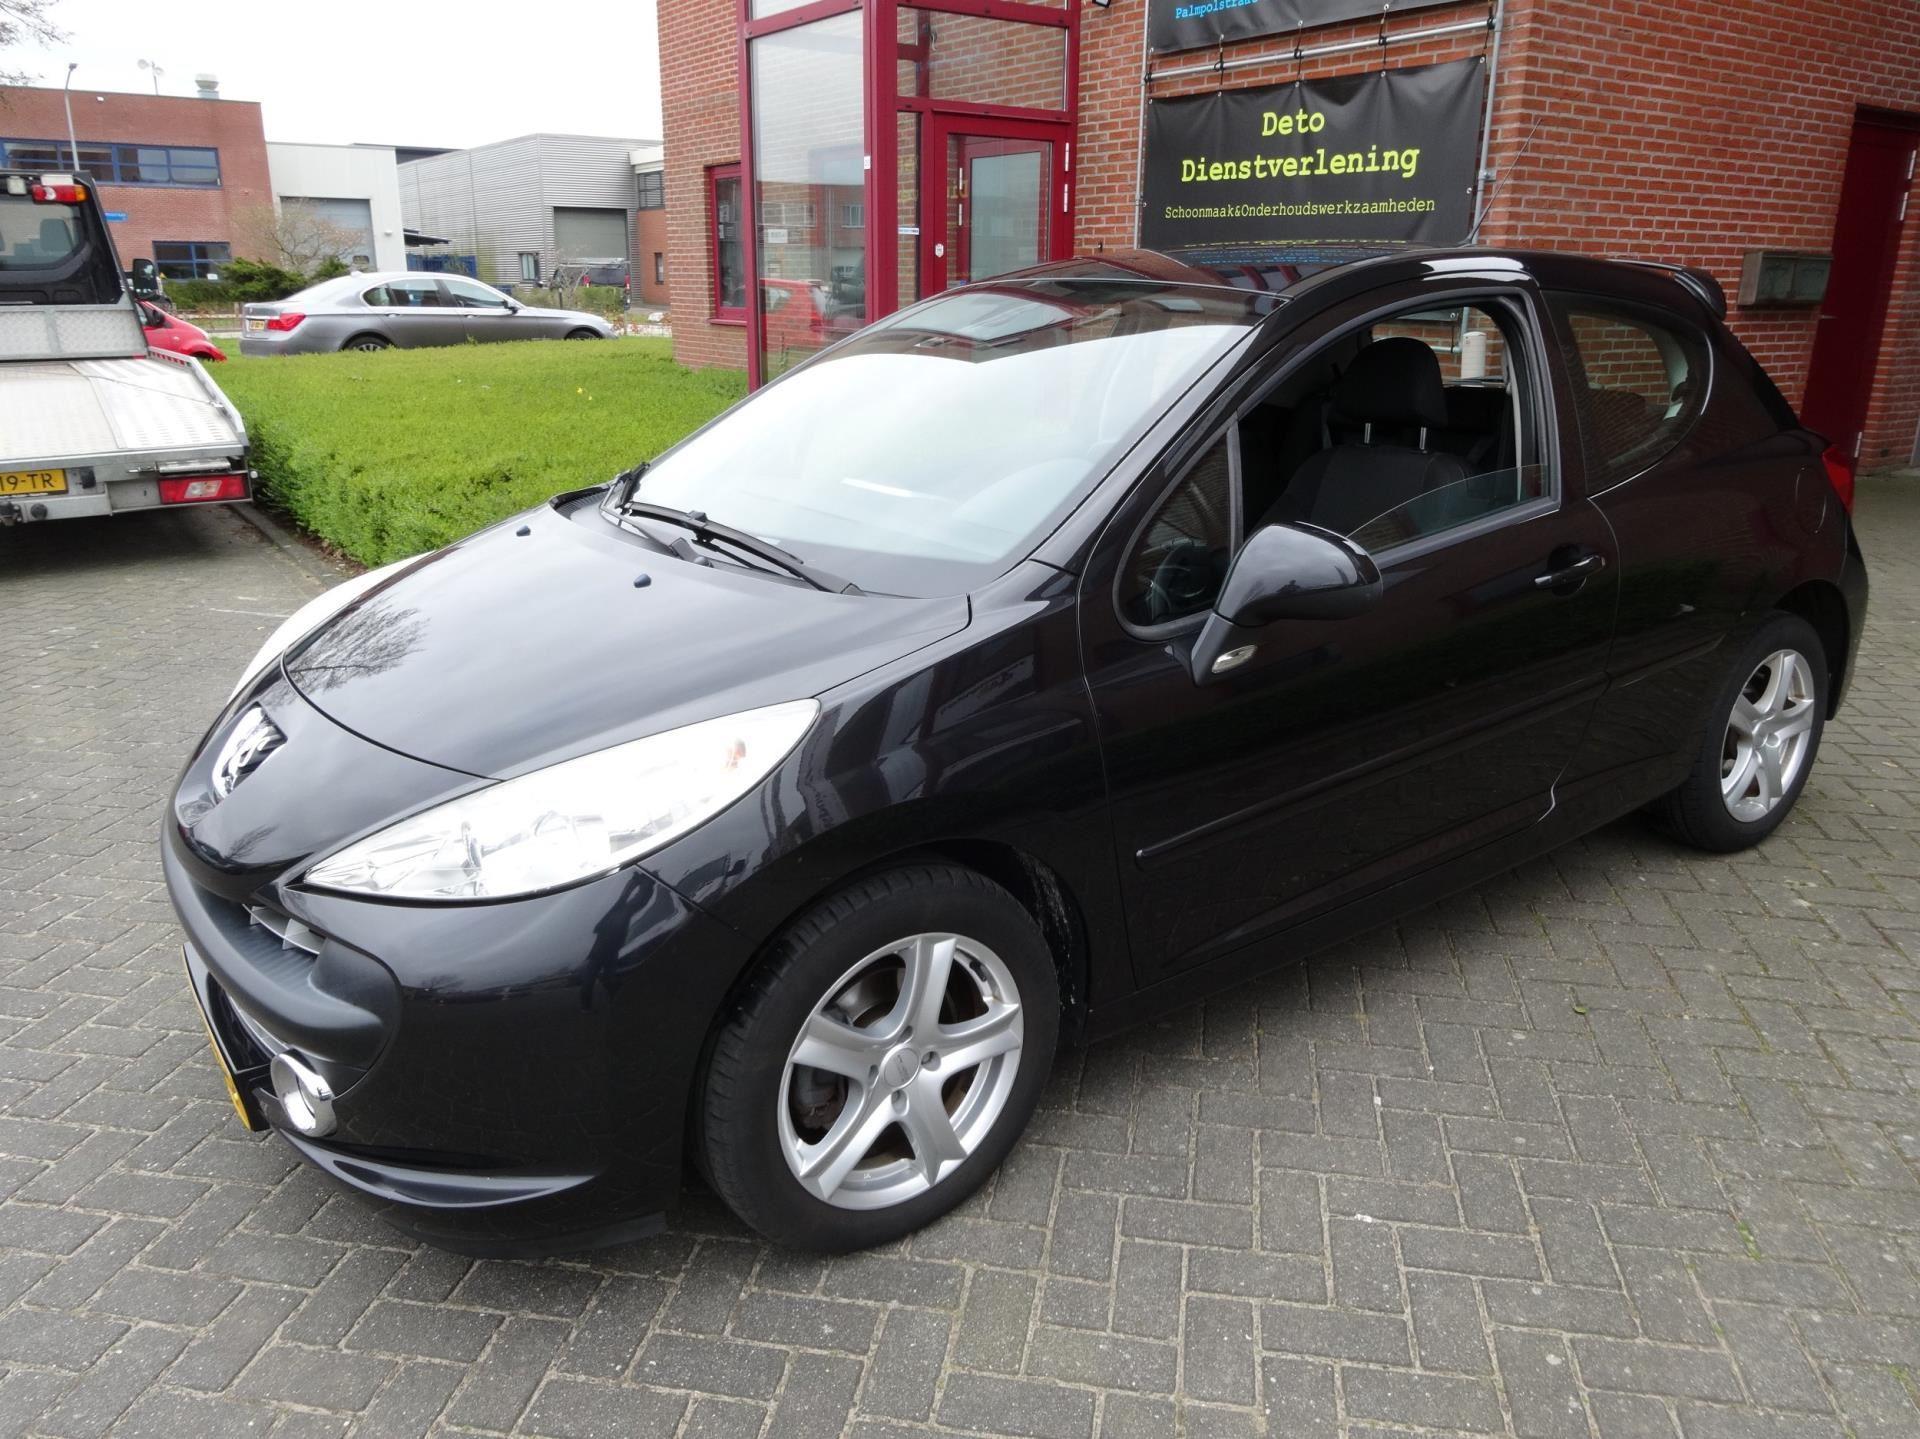 Peugeot 207 occasion - Handelsonderneming Deto